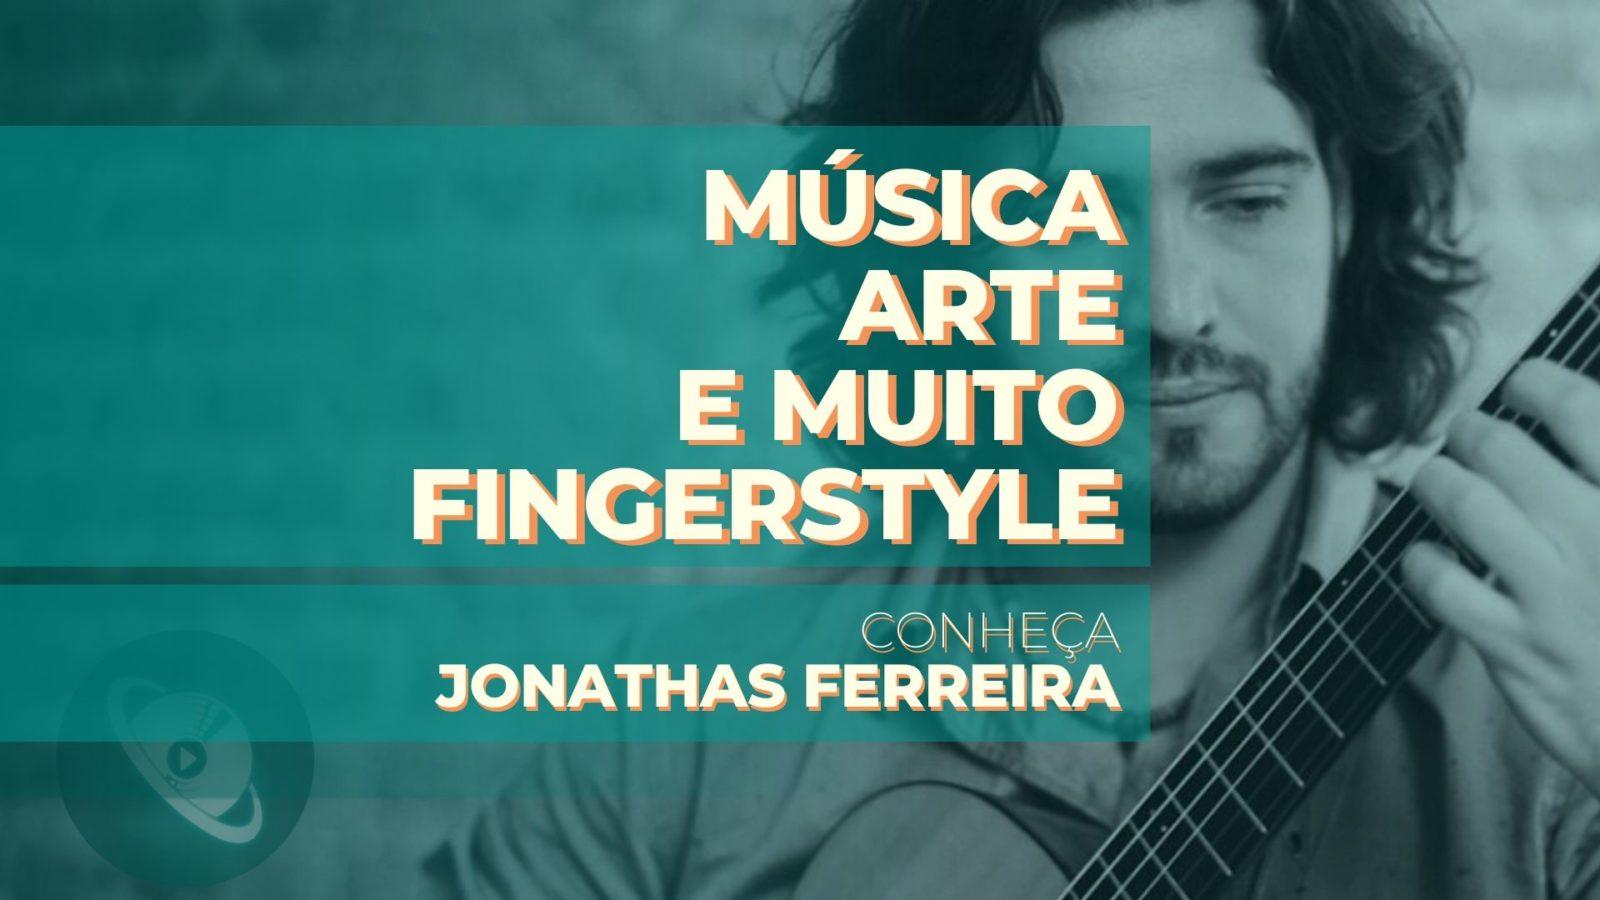 Jonathas Ferreira